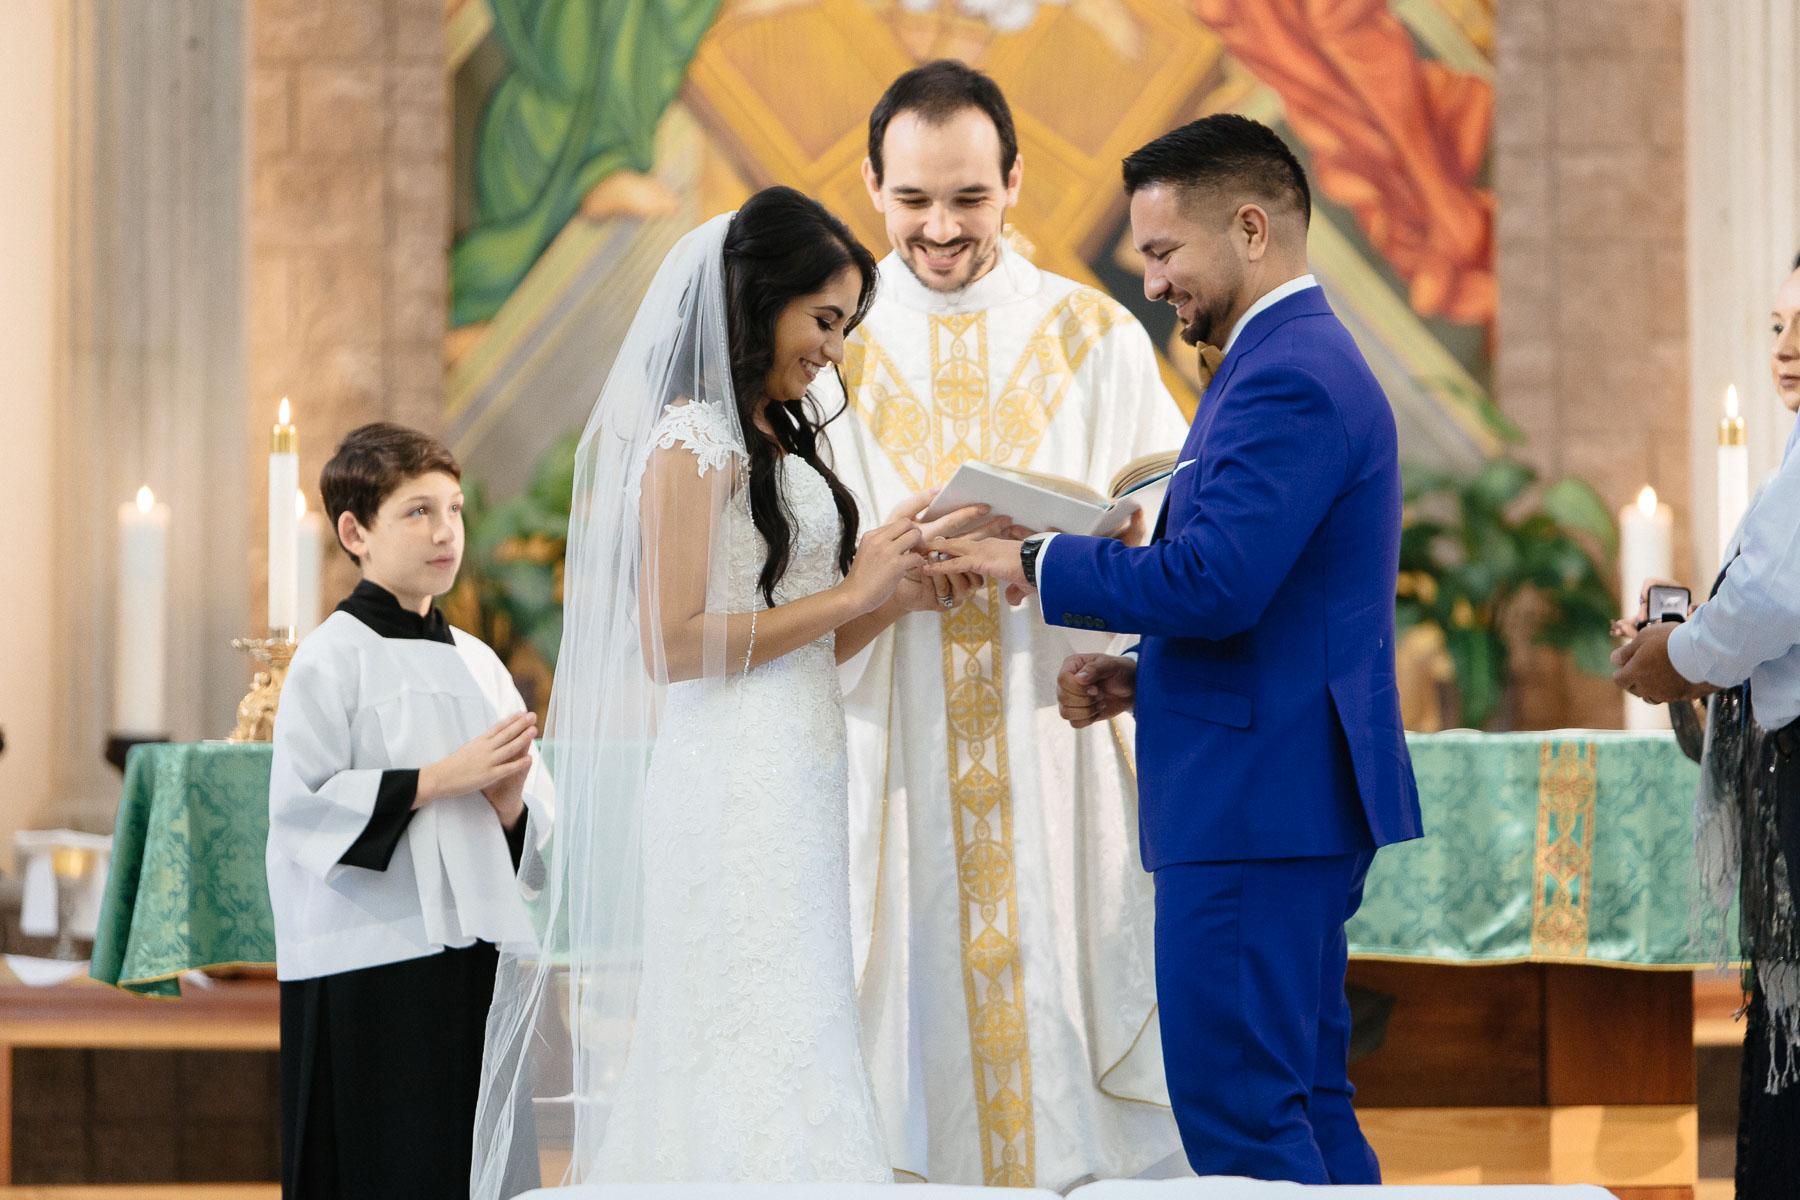 161029-Luxium-Weddings-Arizona-Jeff-Griselda-First-Look-Val-Vista-Lakes-Gilber-037.jpg